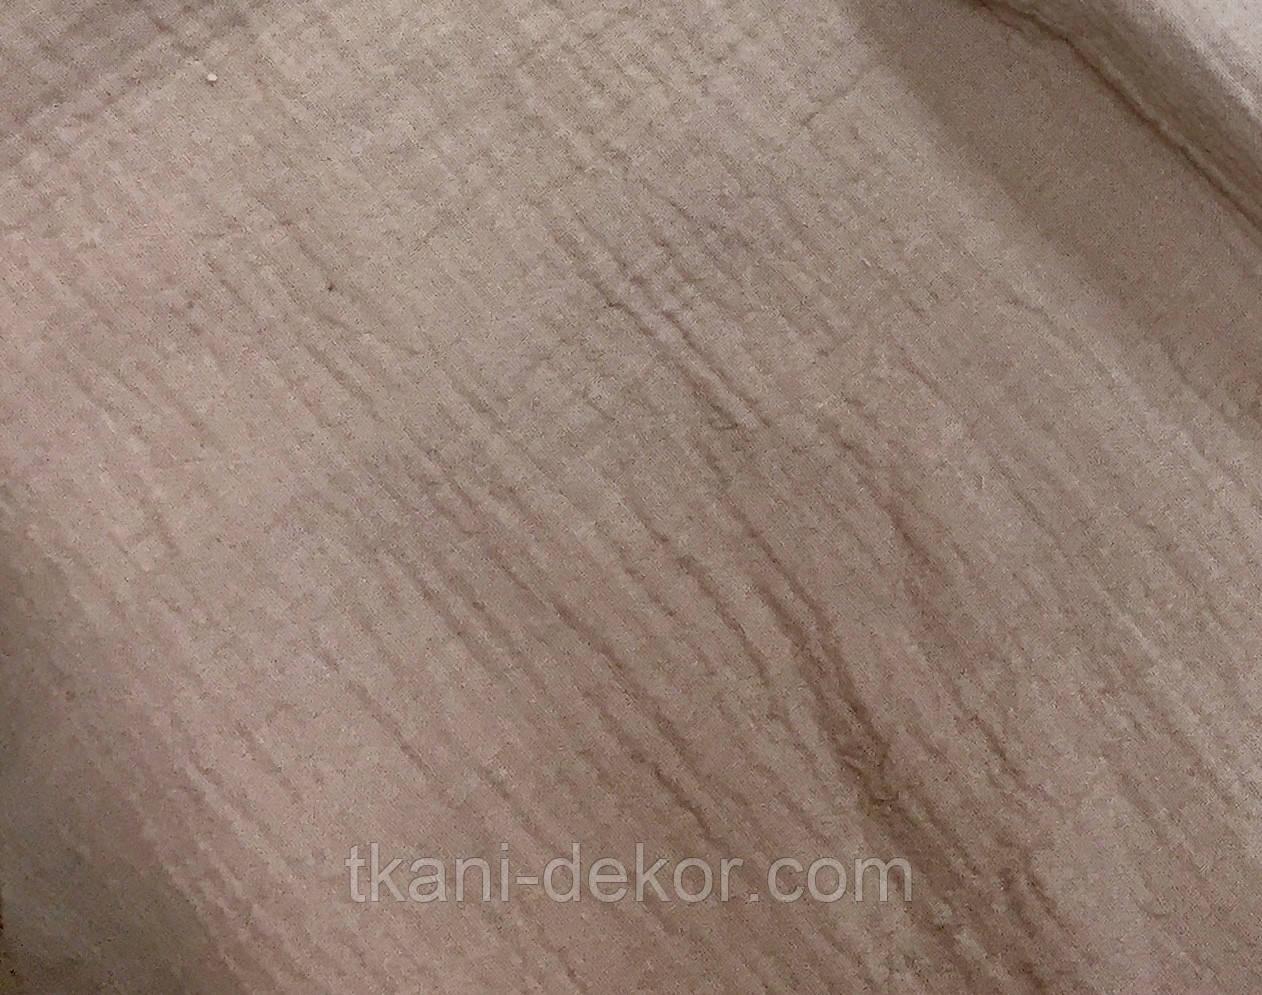 Муслин (хлопковая ткань) жатка однотон чайная роза  (ширина 1,35 м)